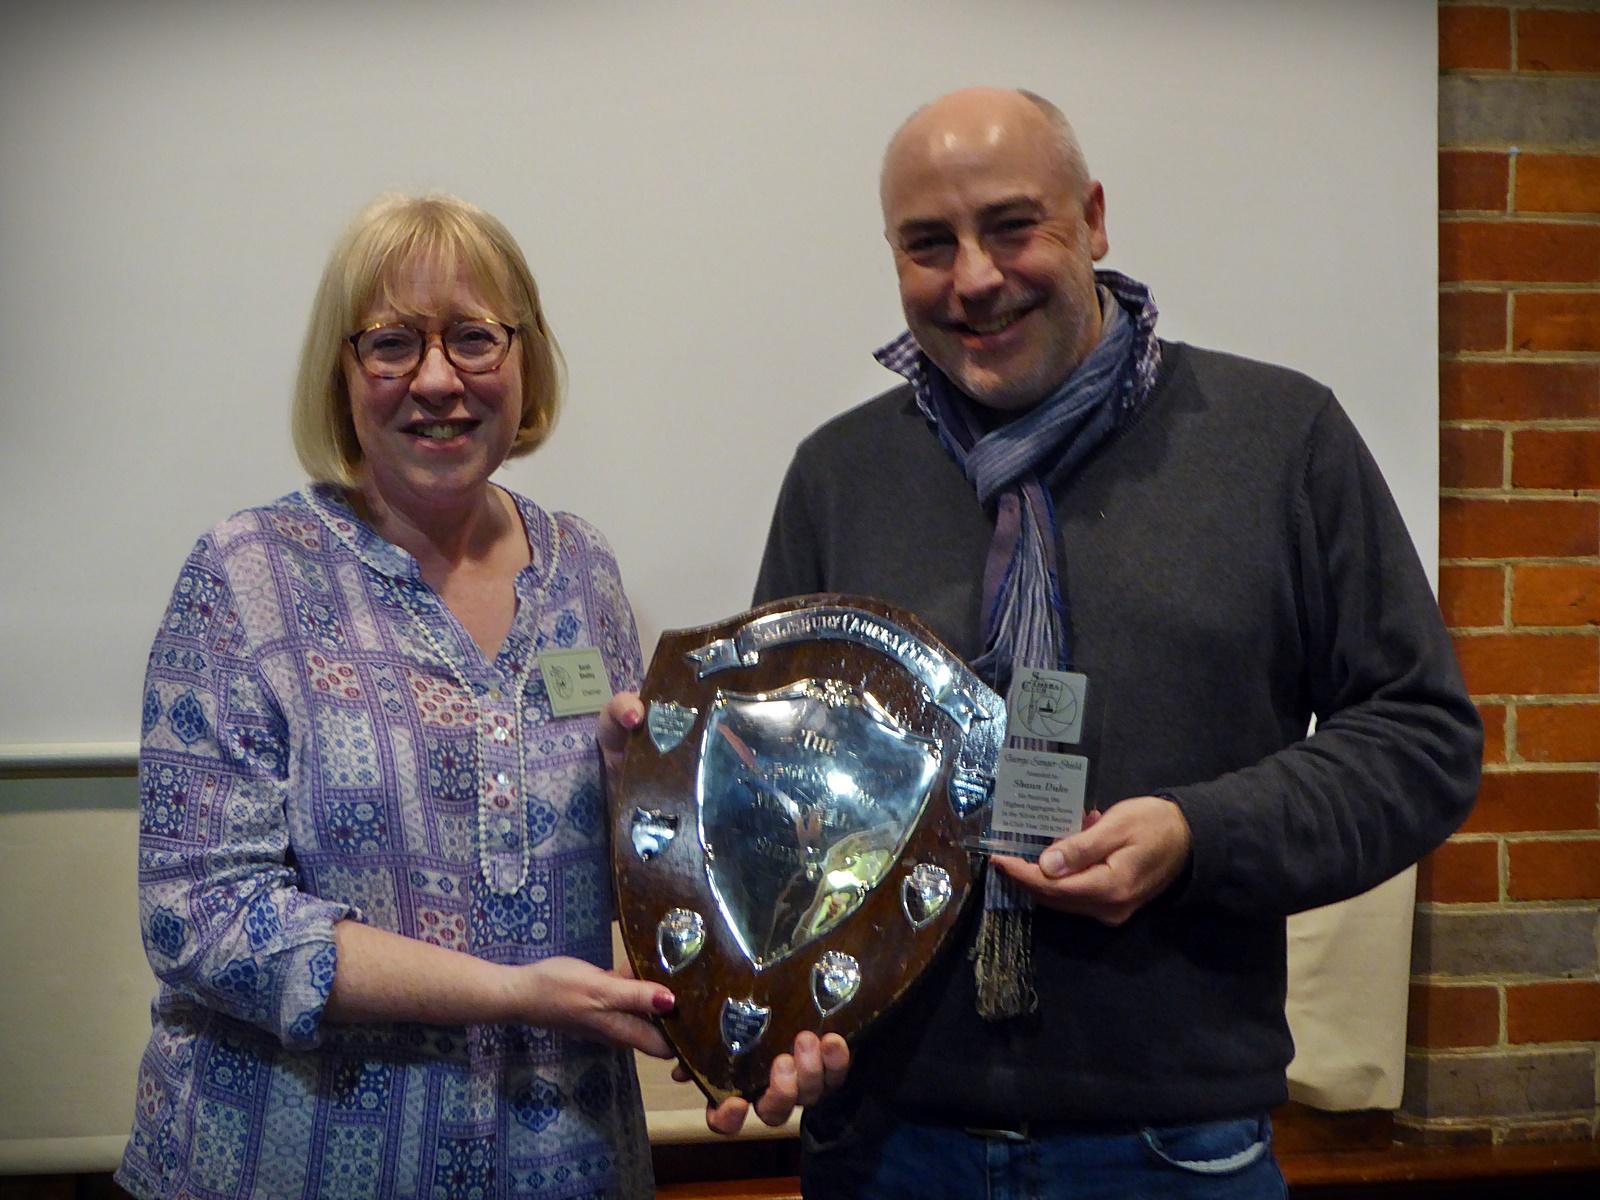 George Sanger Trophy - Shaun Duke